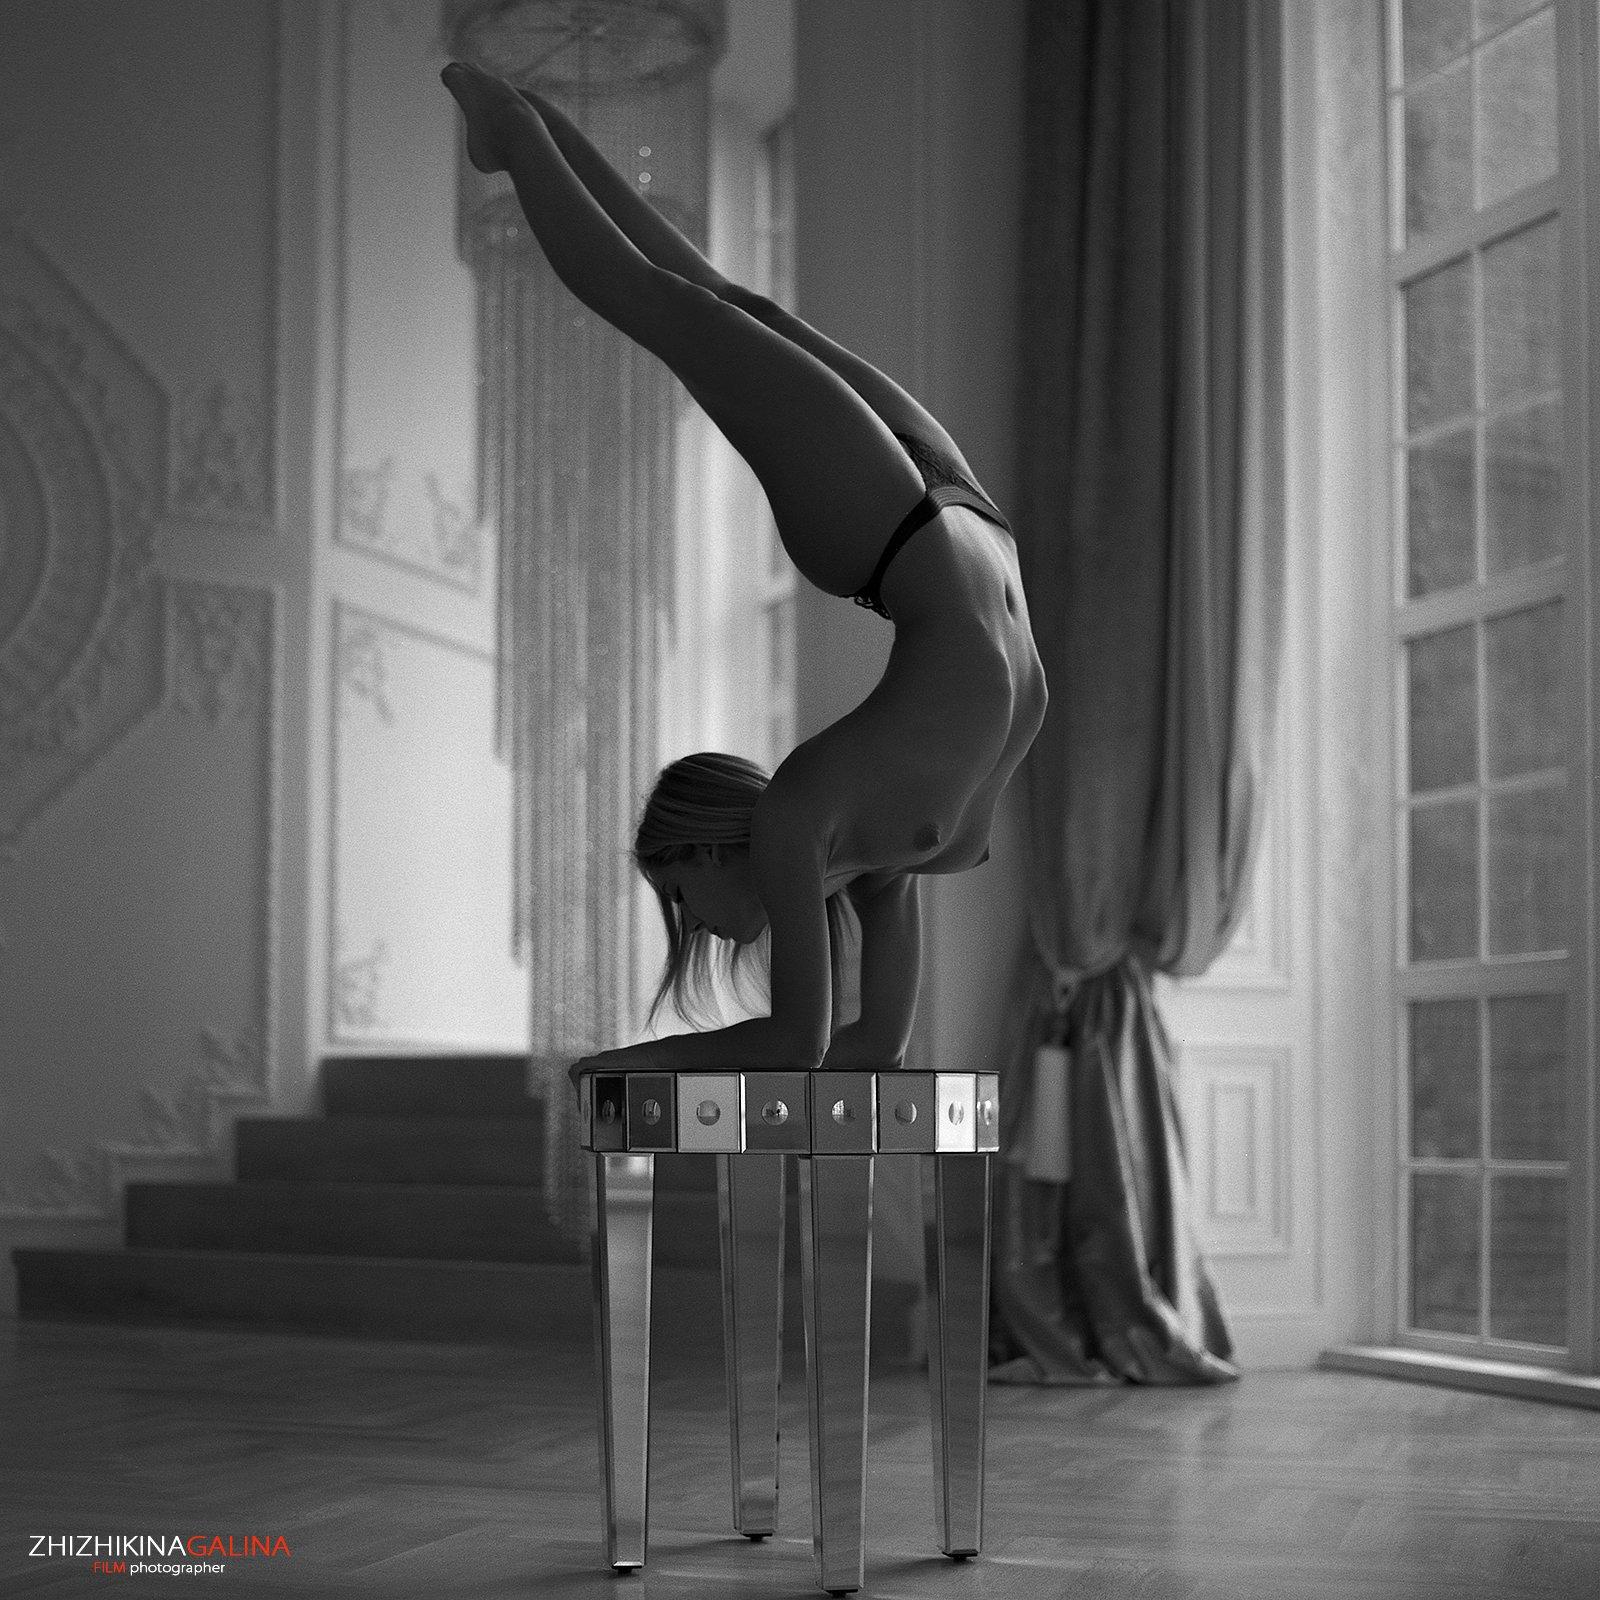 чб, ню, артню, гимнастка, пленка, фото, фотография, film, bw, nu, nude, girl, photo, Галина Жижикина